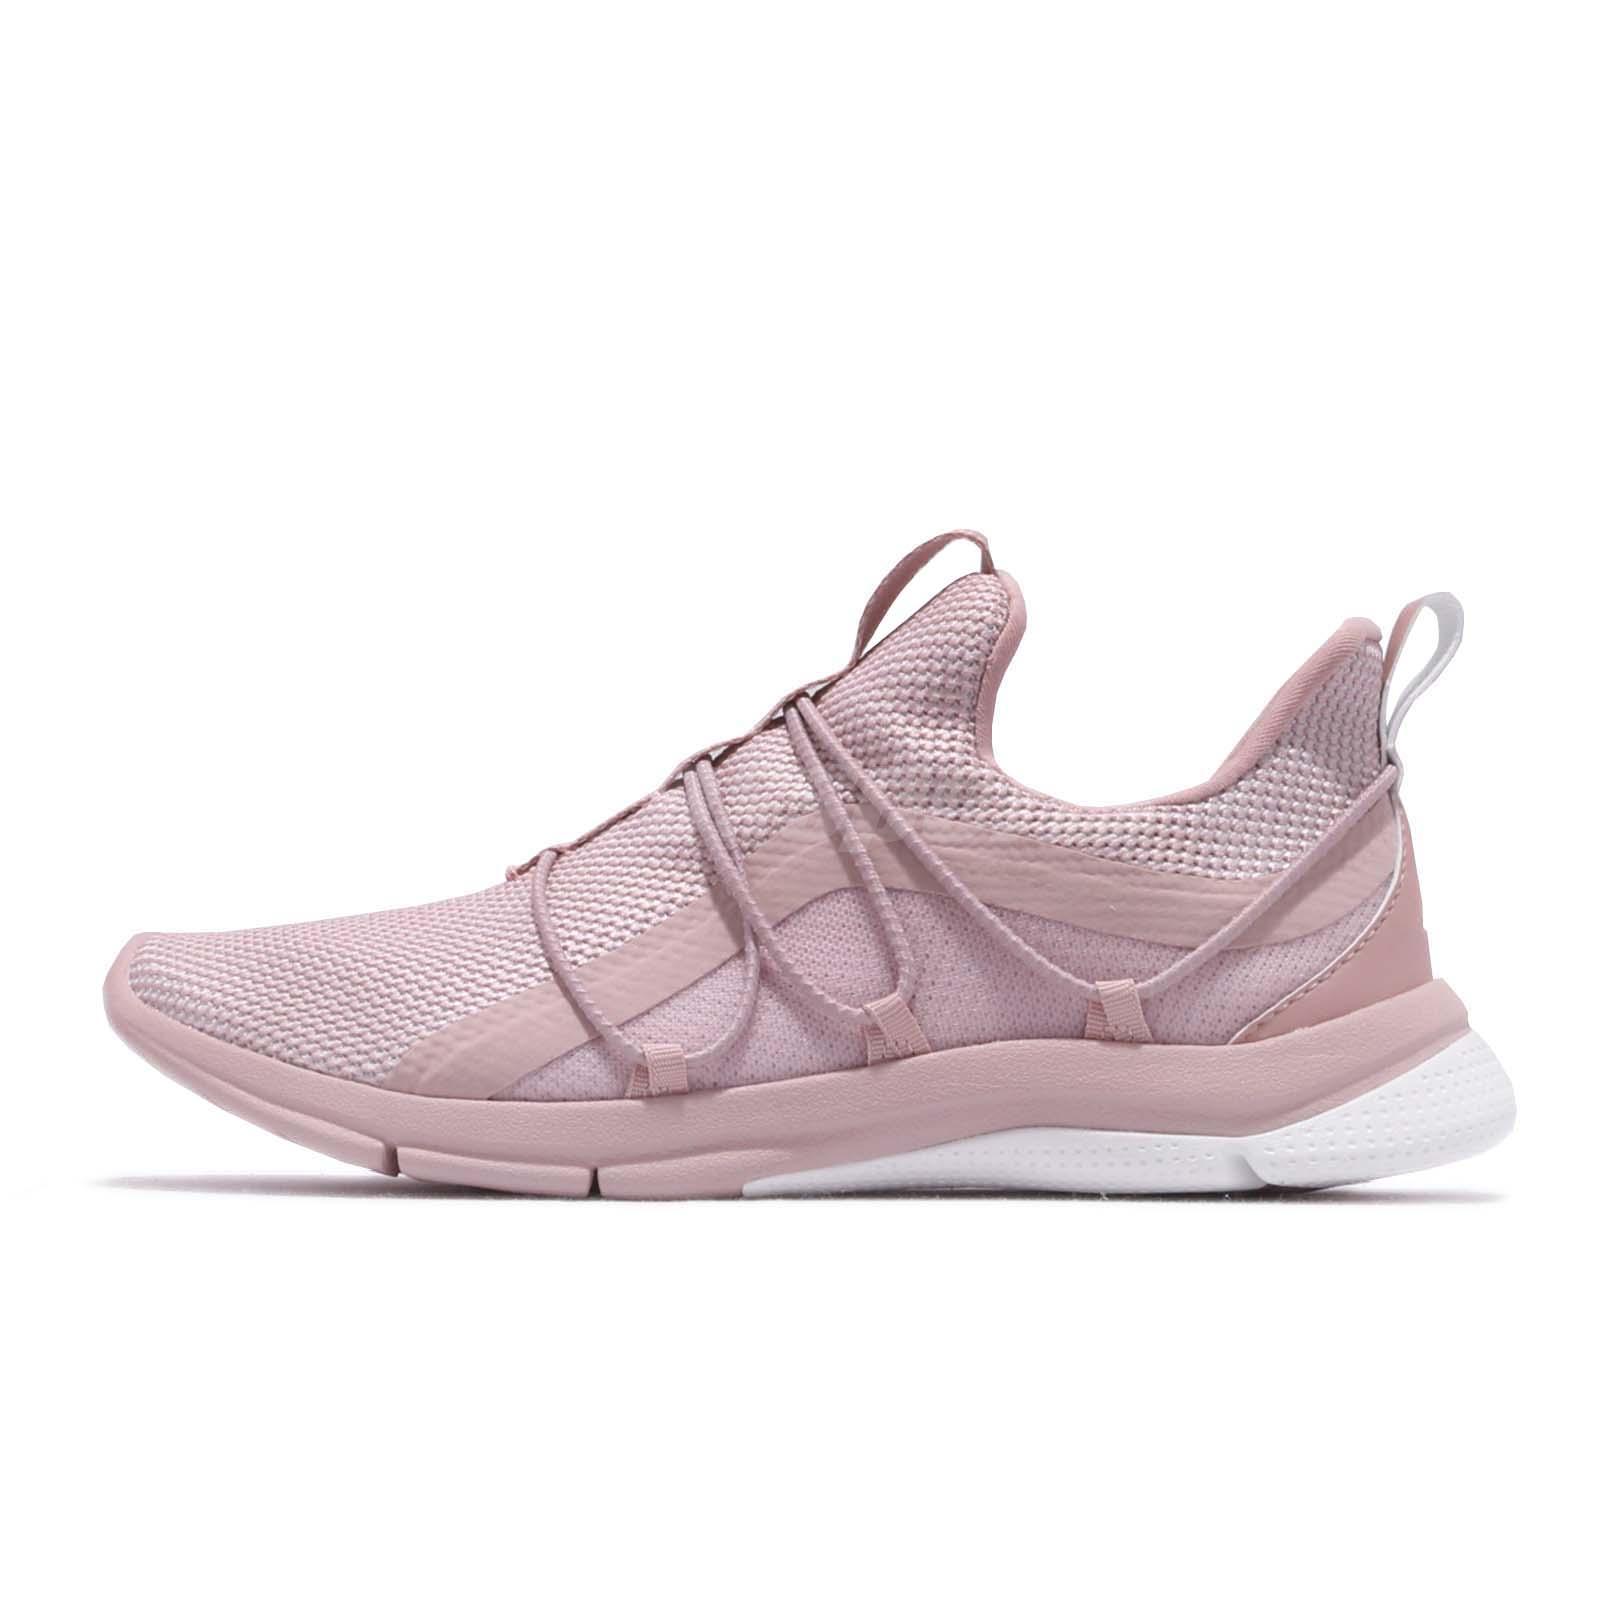 2669ec0fc65c Reebok Print Her 3.0 Lace Ashen Lilac White Women Running Slip On Shoes  DV4426